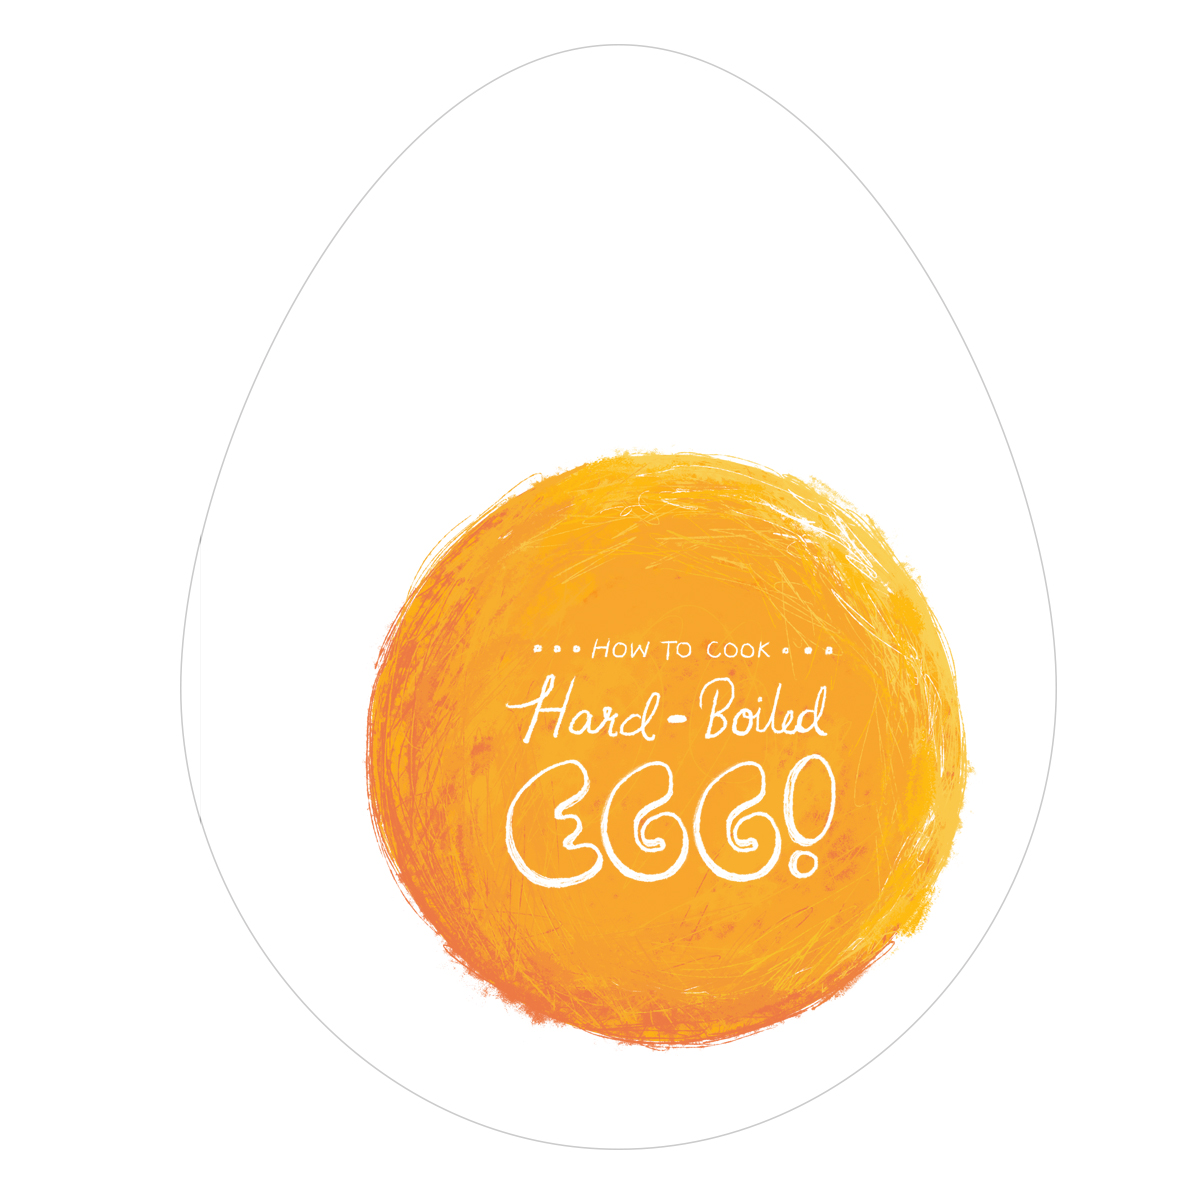 Eggfographic_forweb.jpg